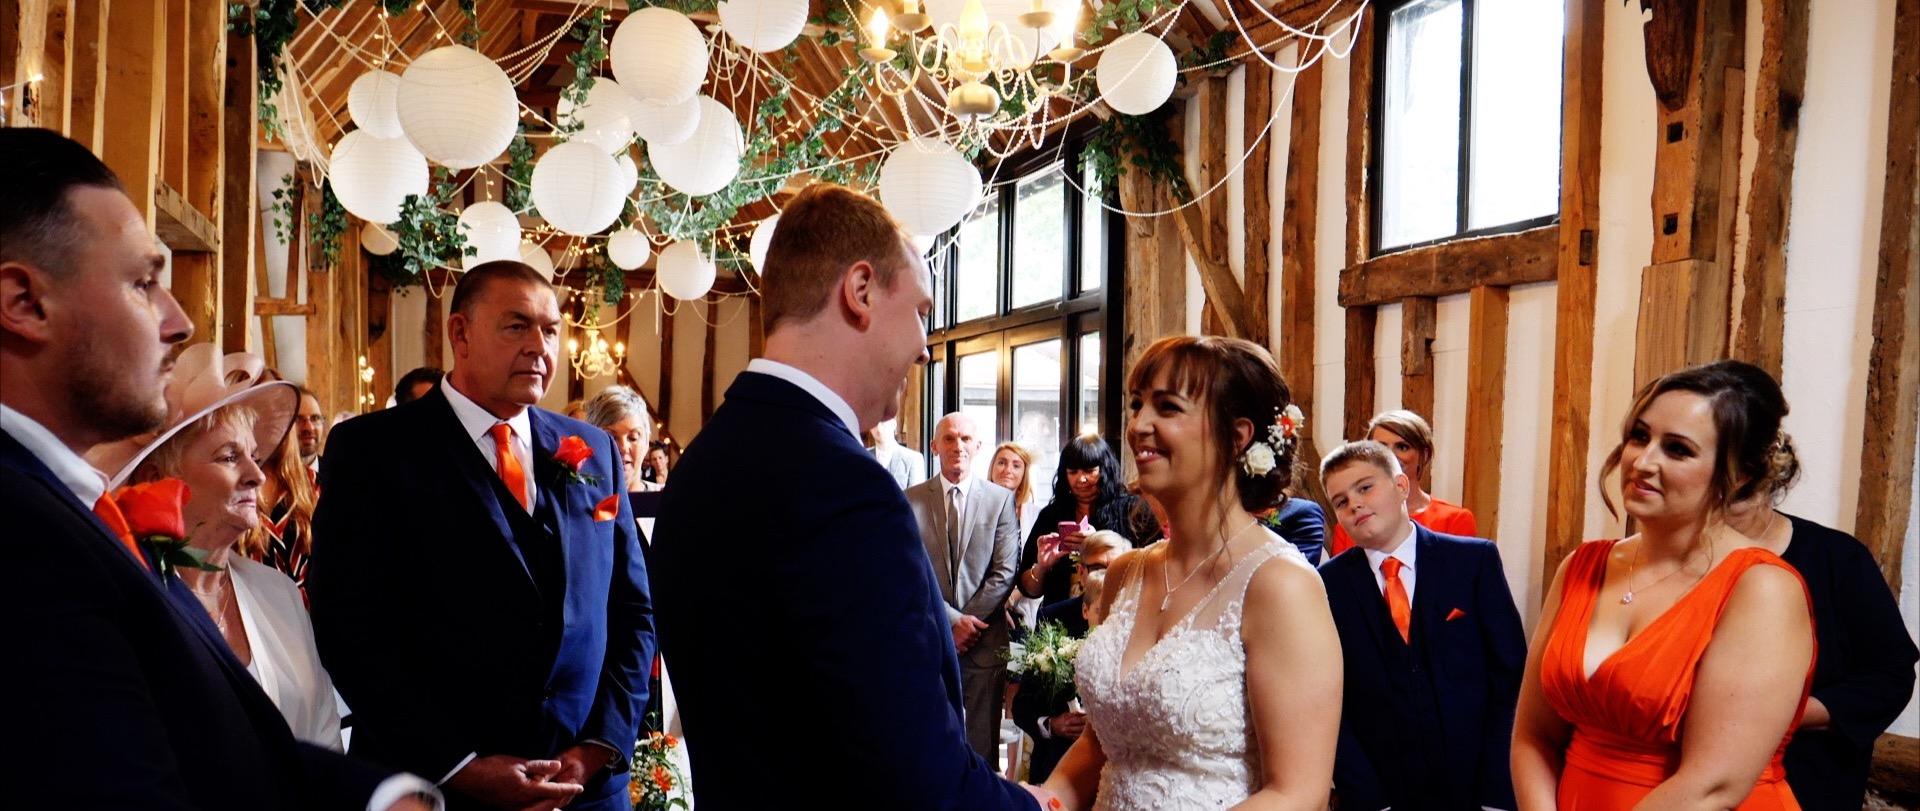 Wedding Ceremony High House Althorne